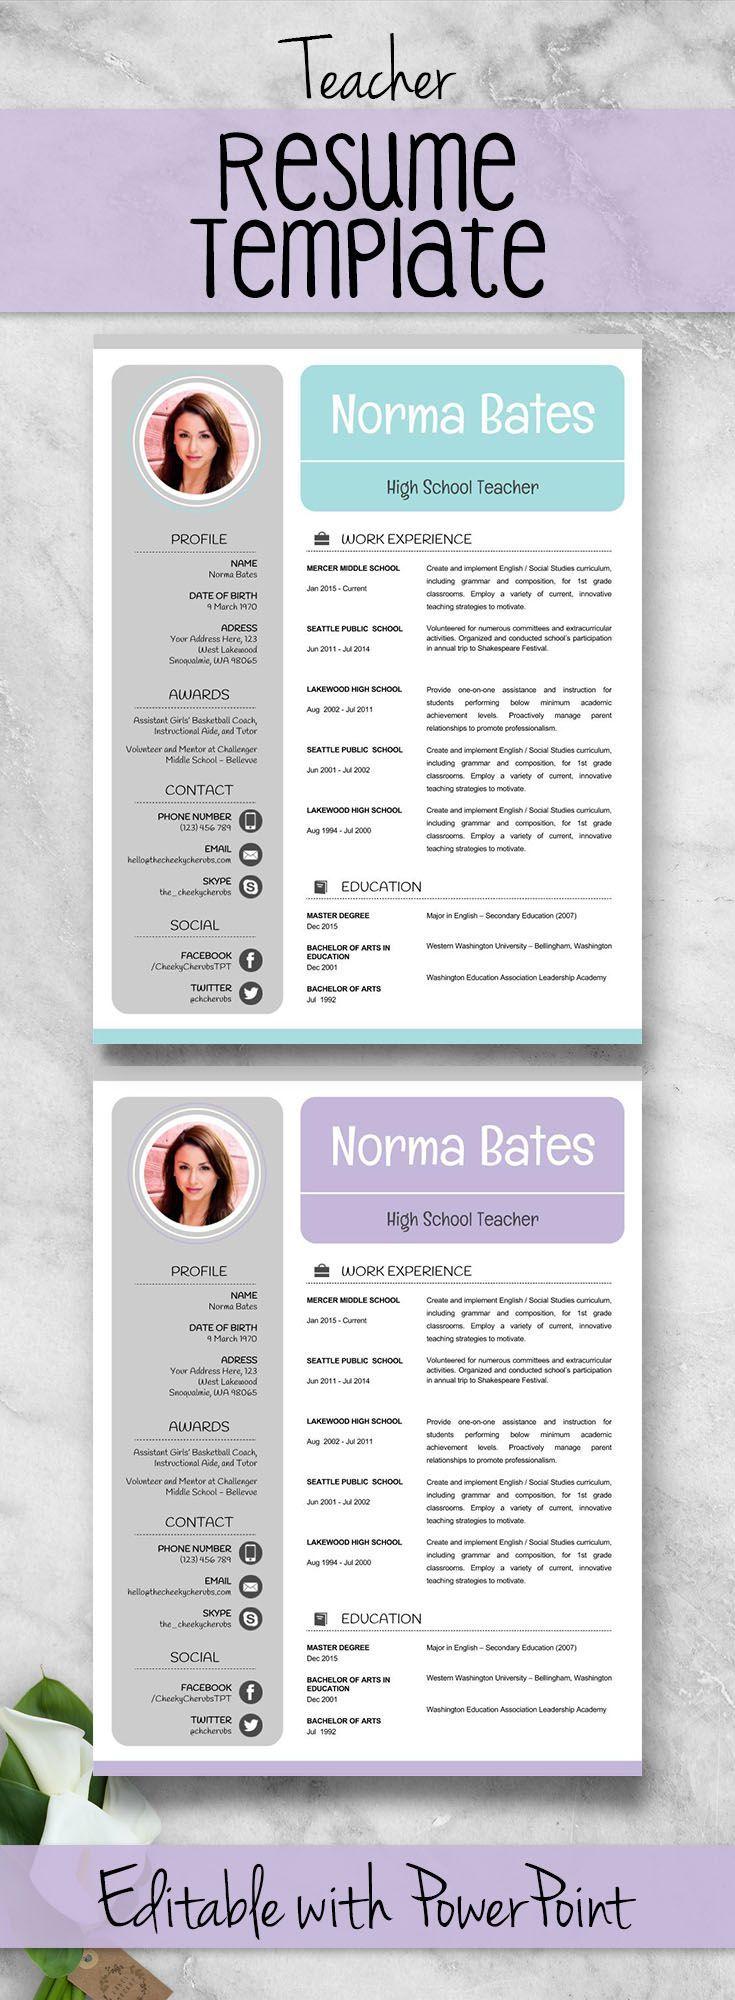 sample resume showing references